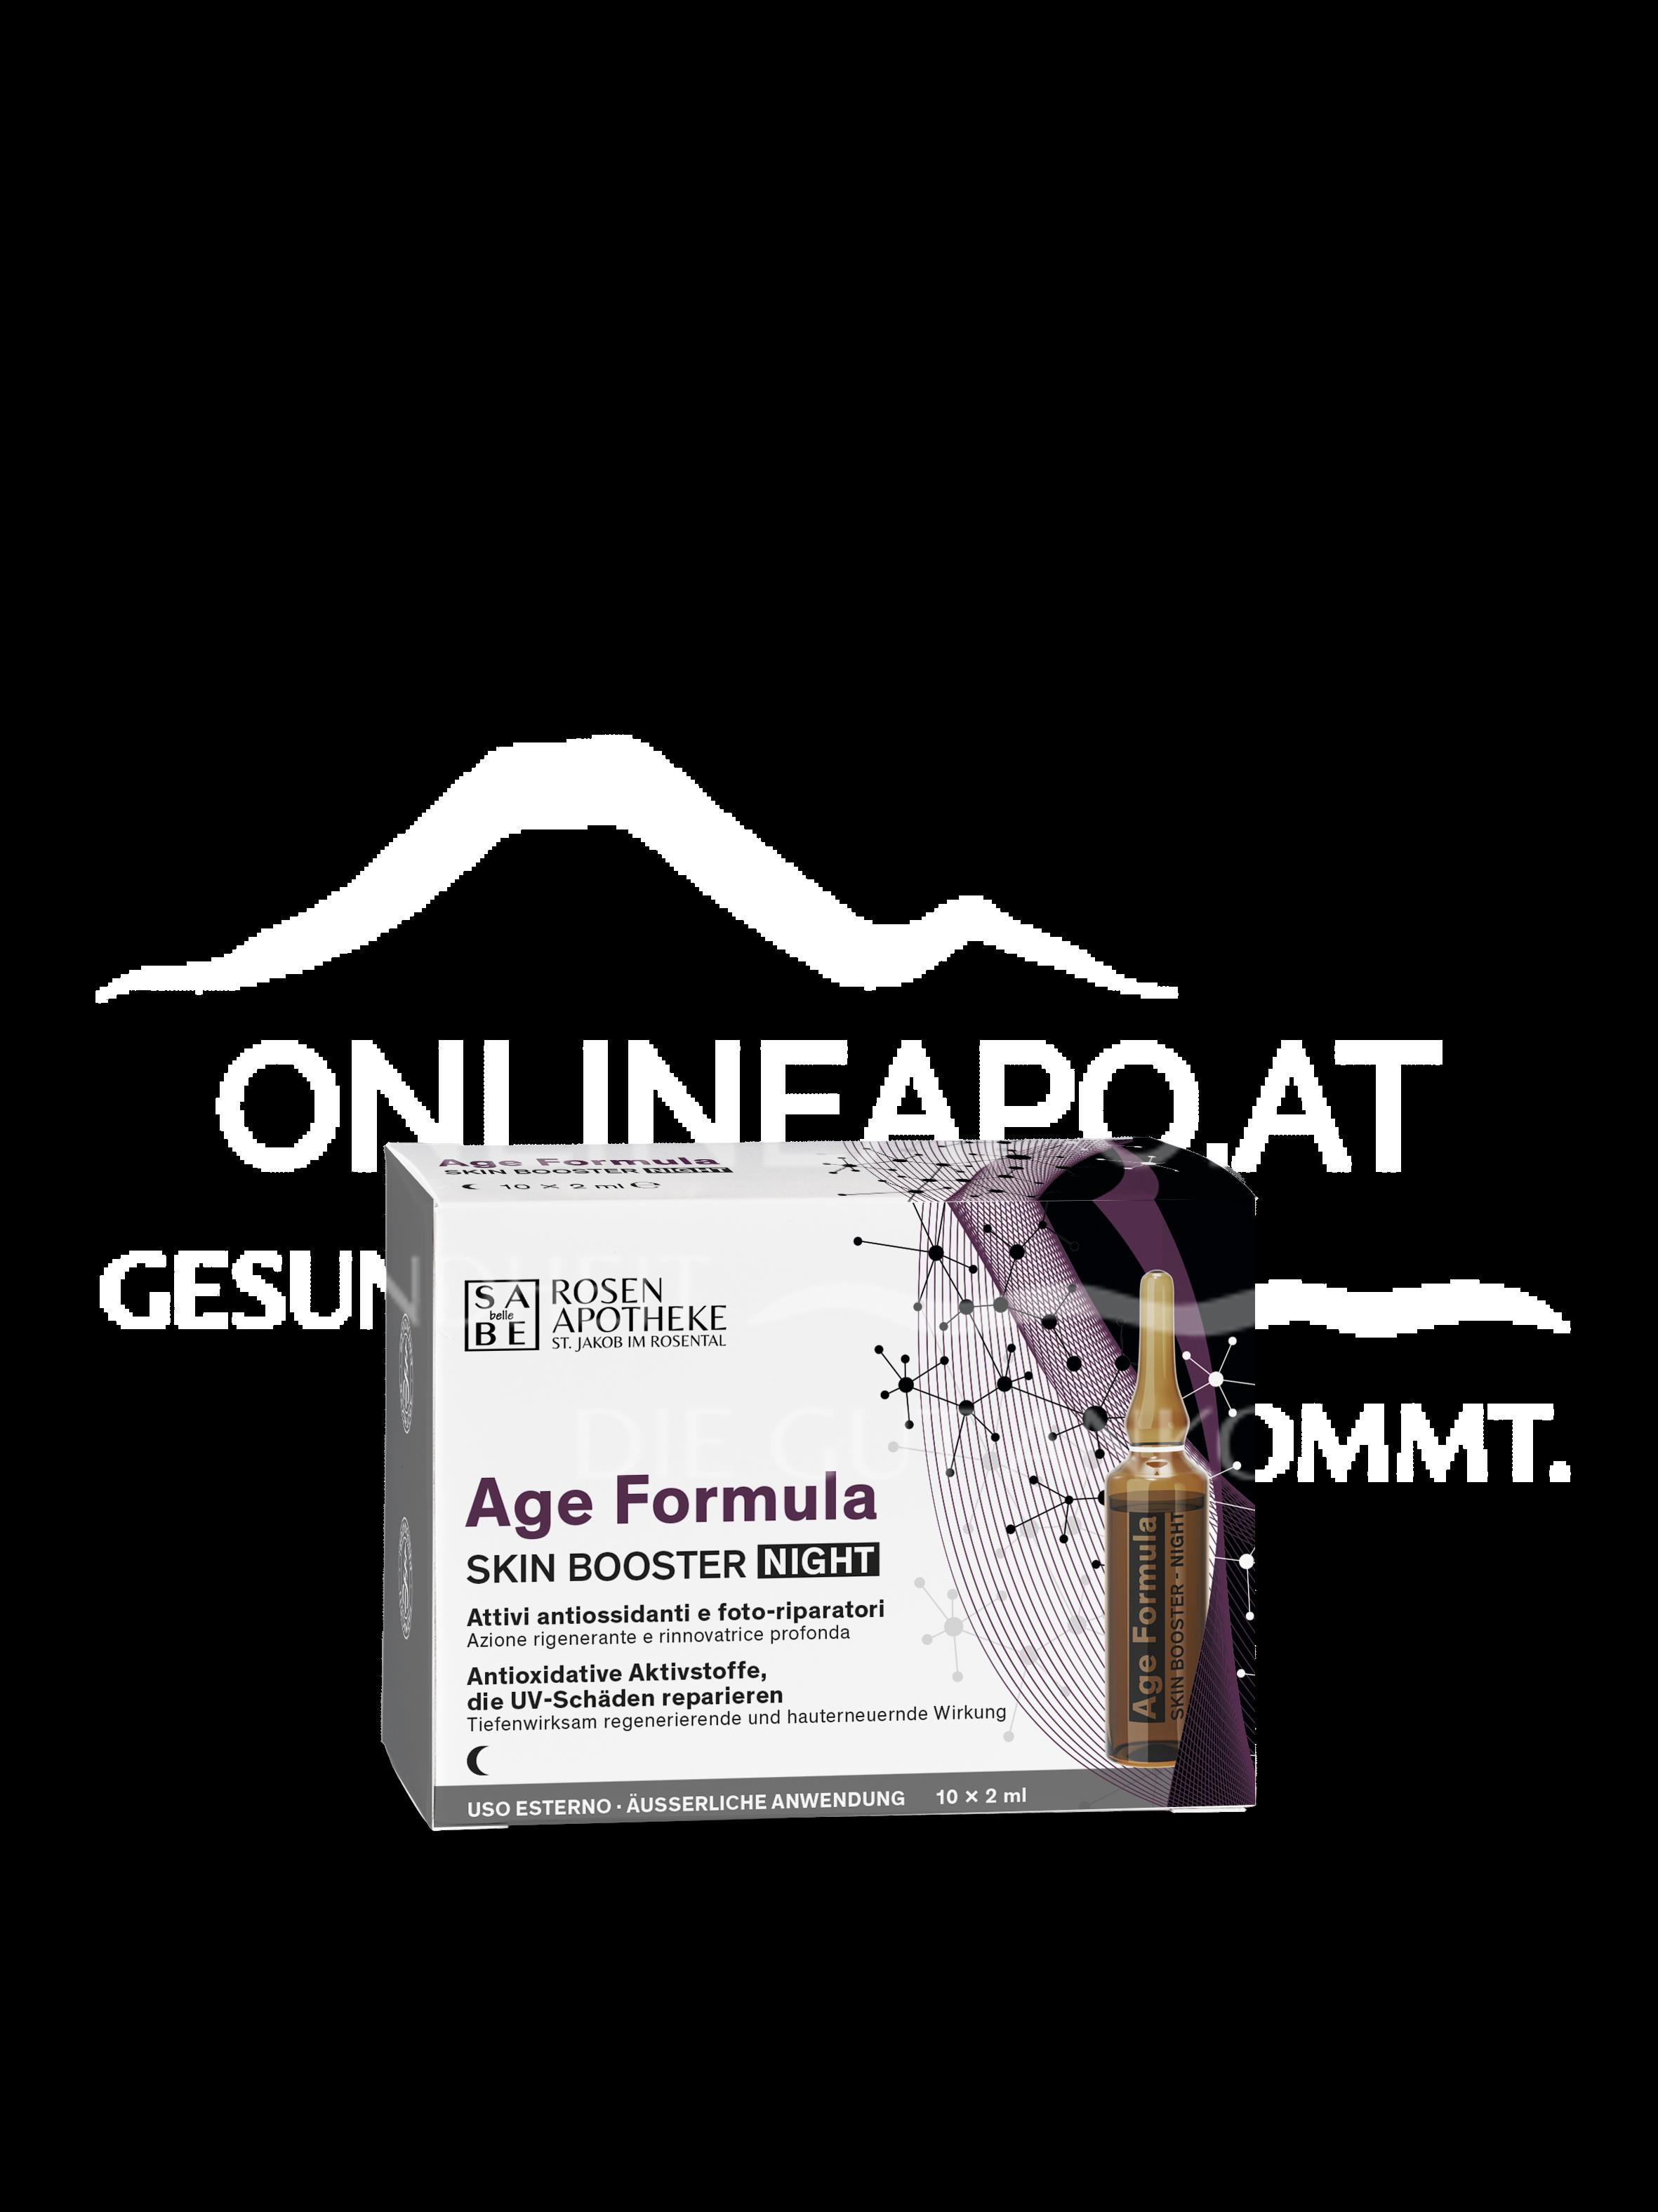 SABE belle Age Formula Skin Booster Night à 2 ml